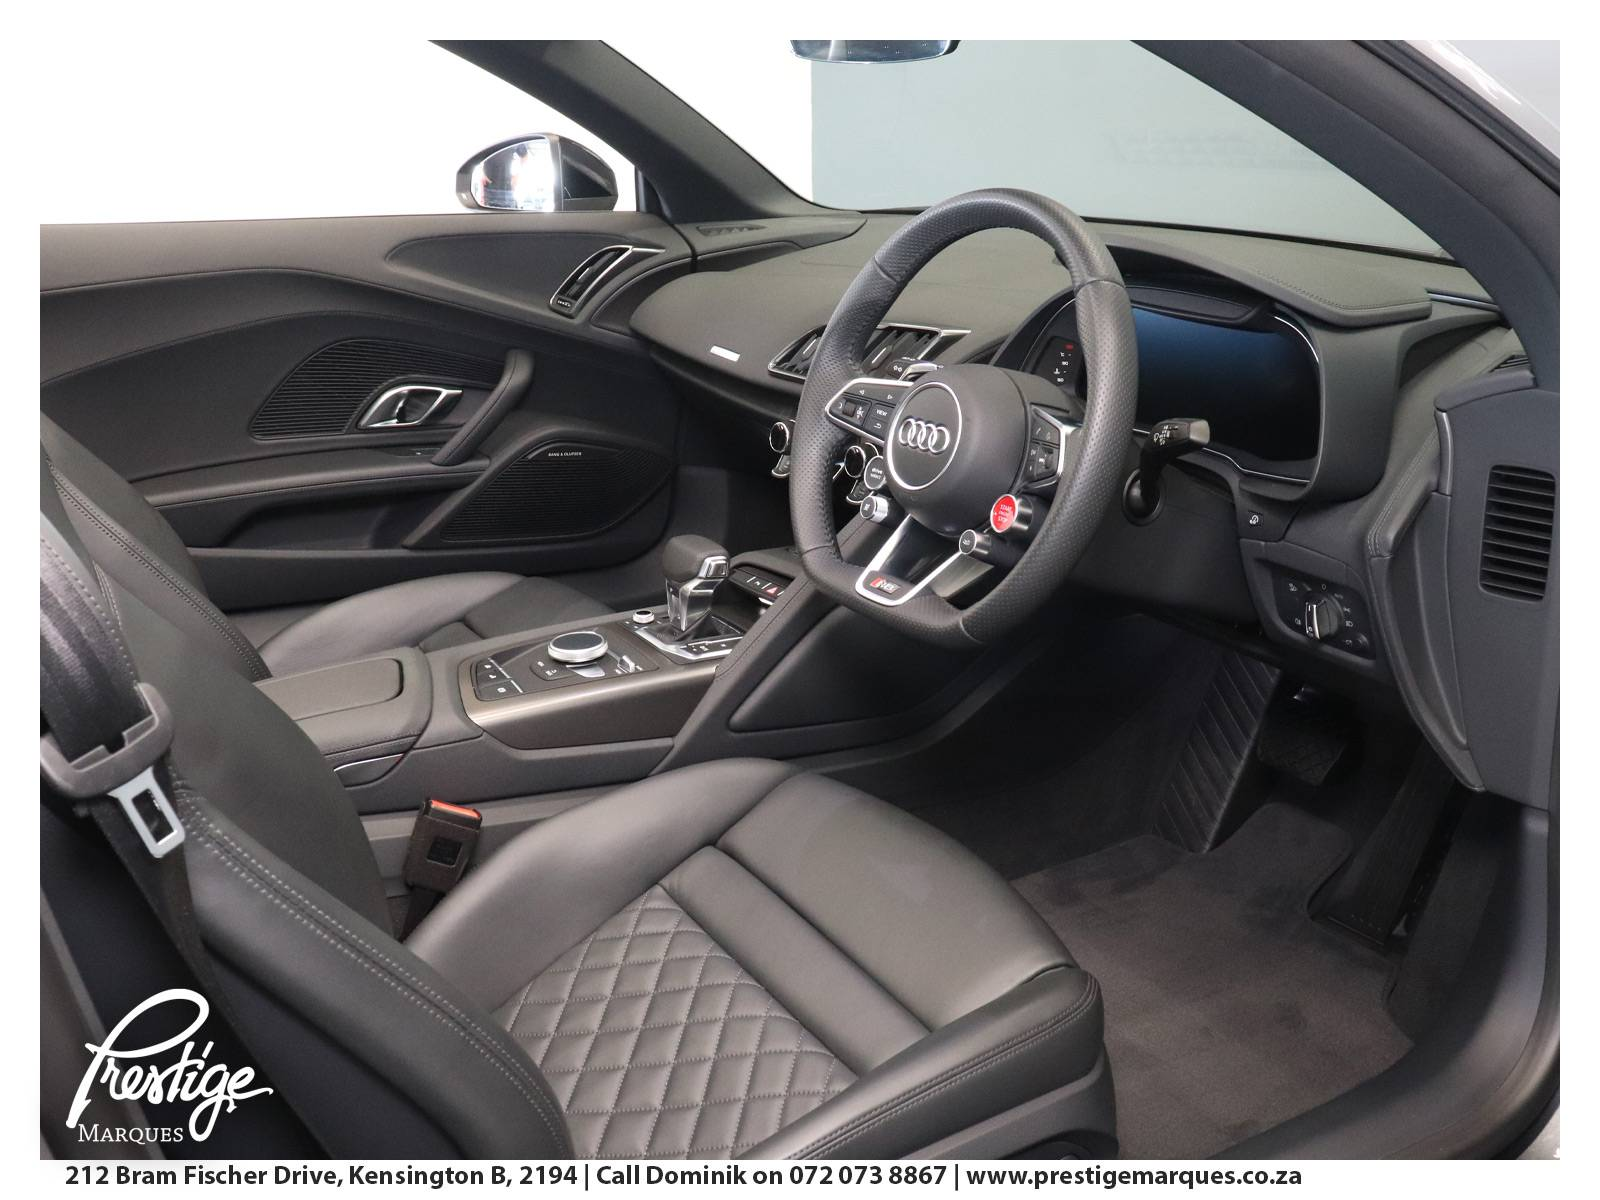 2019-Audi-R8-Prestige-Marques-Randburg-Sandton-17